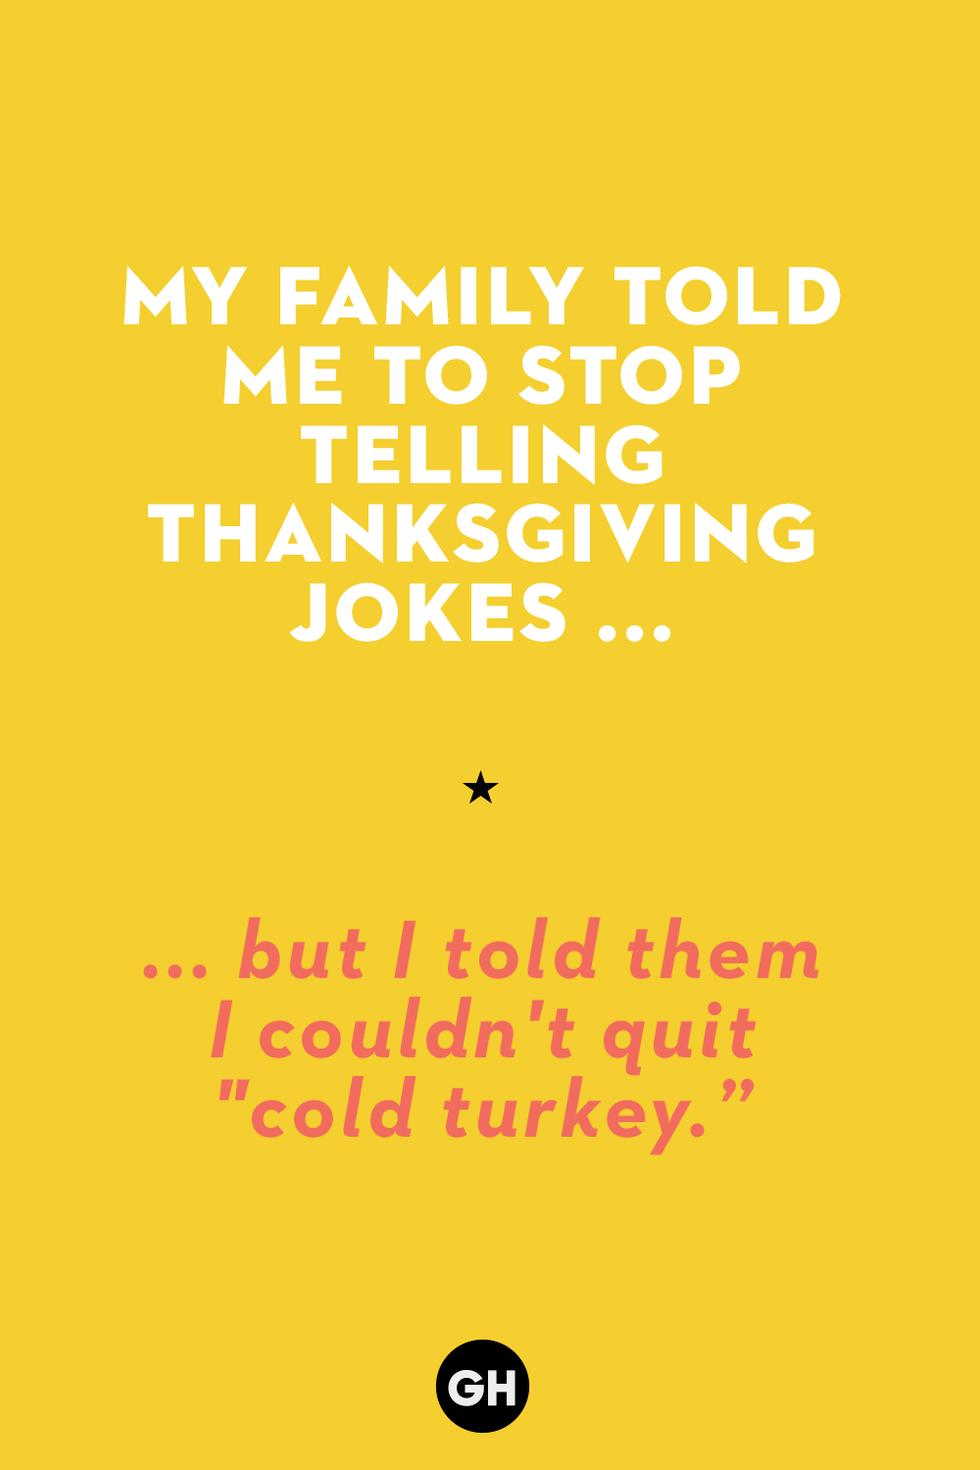 25 Corny But Hilarious Thanksgiving Jokes to Tell This